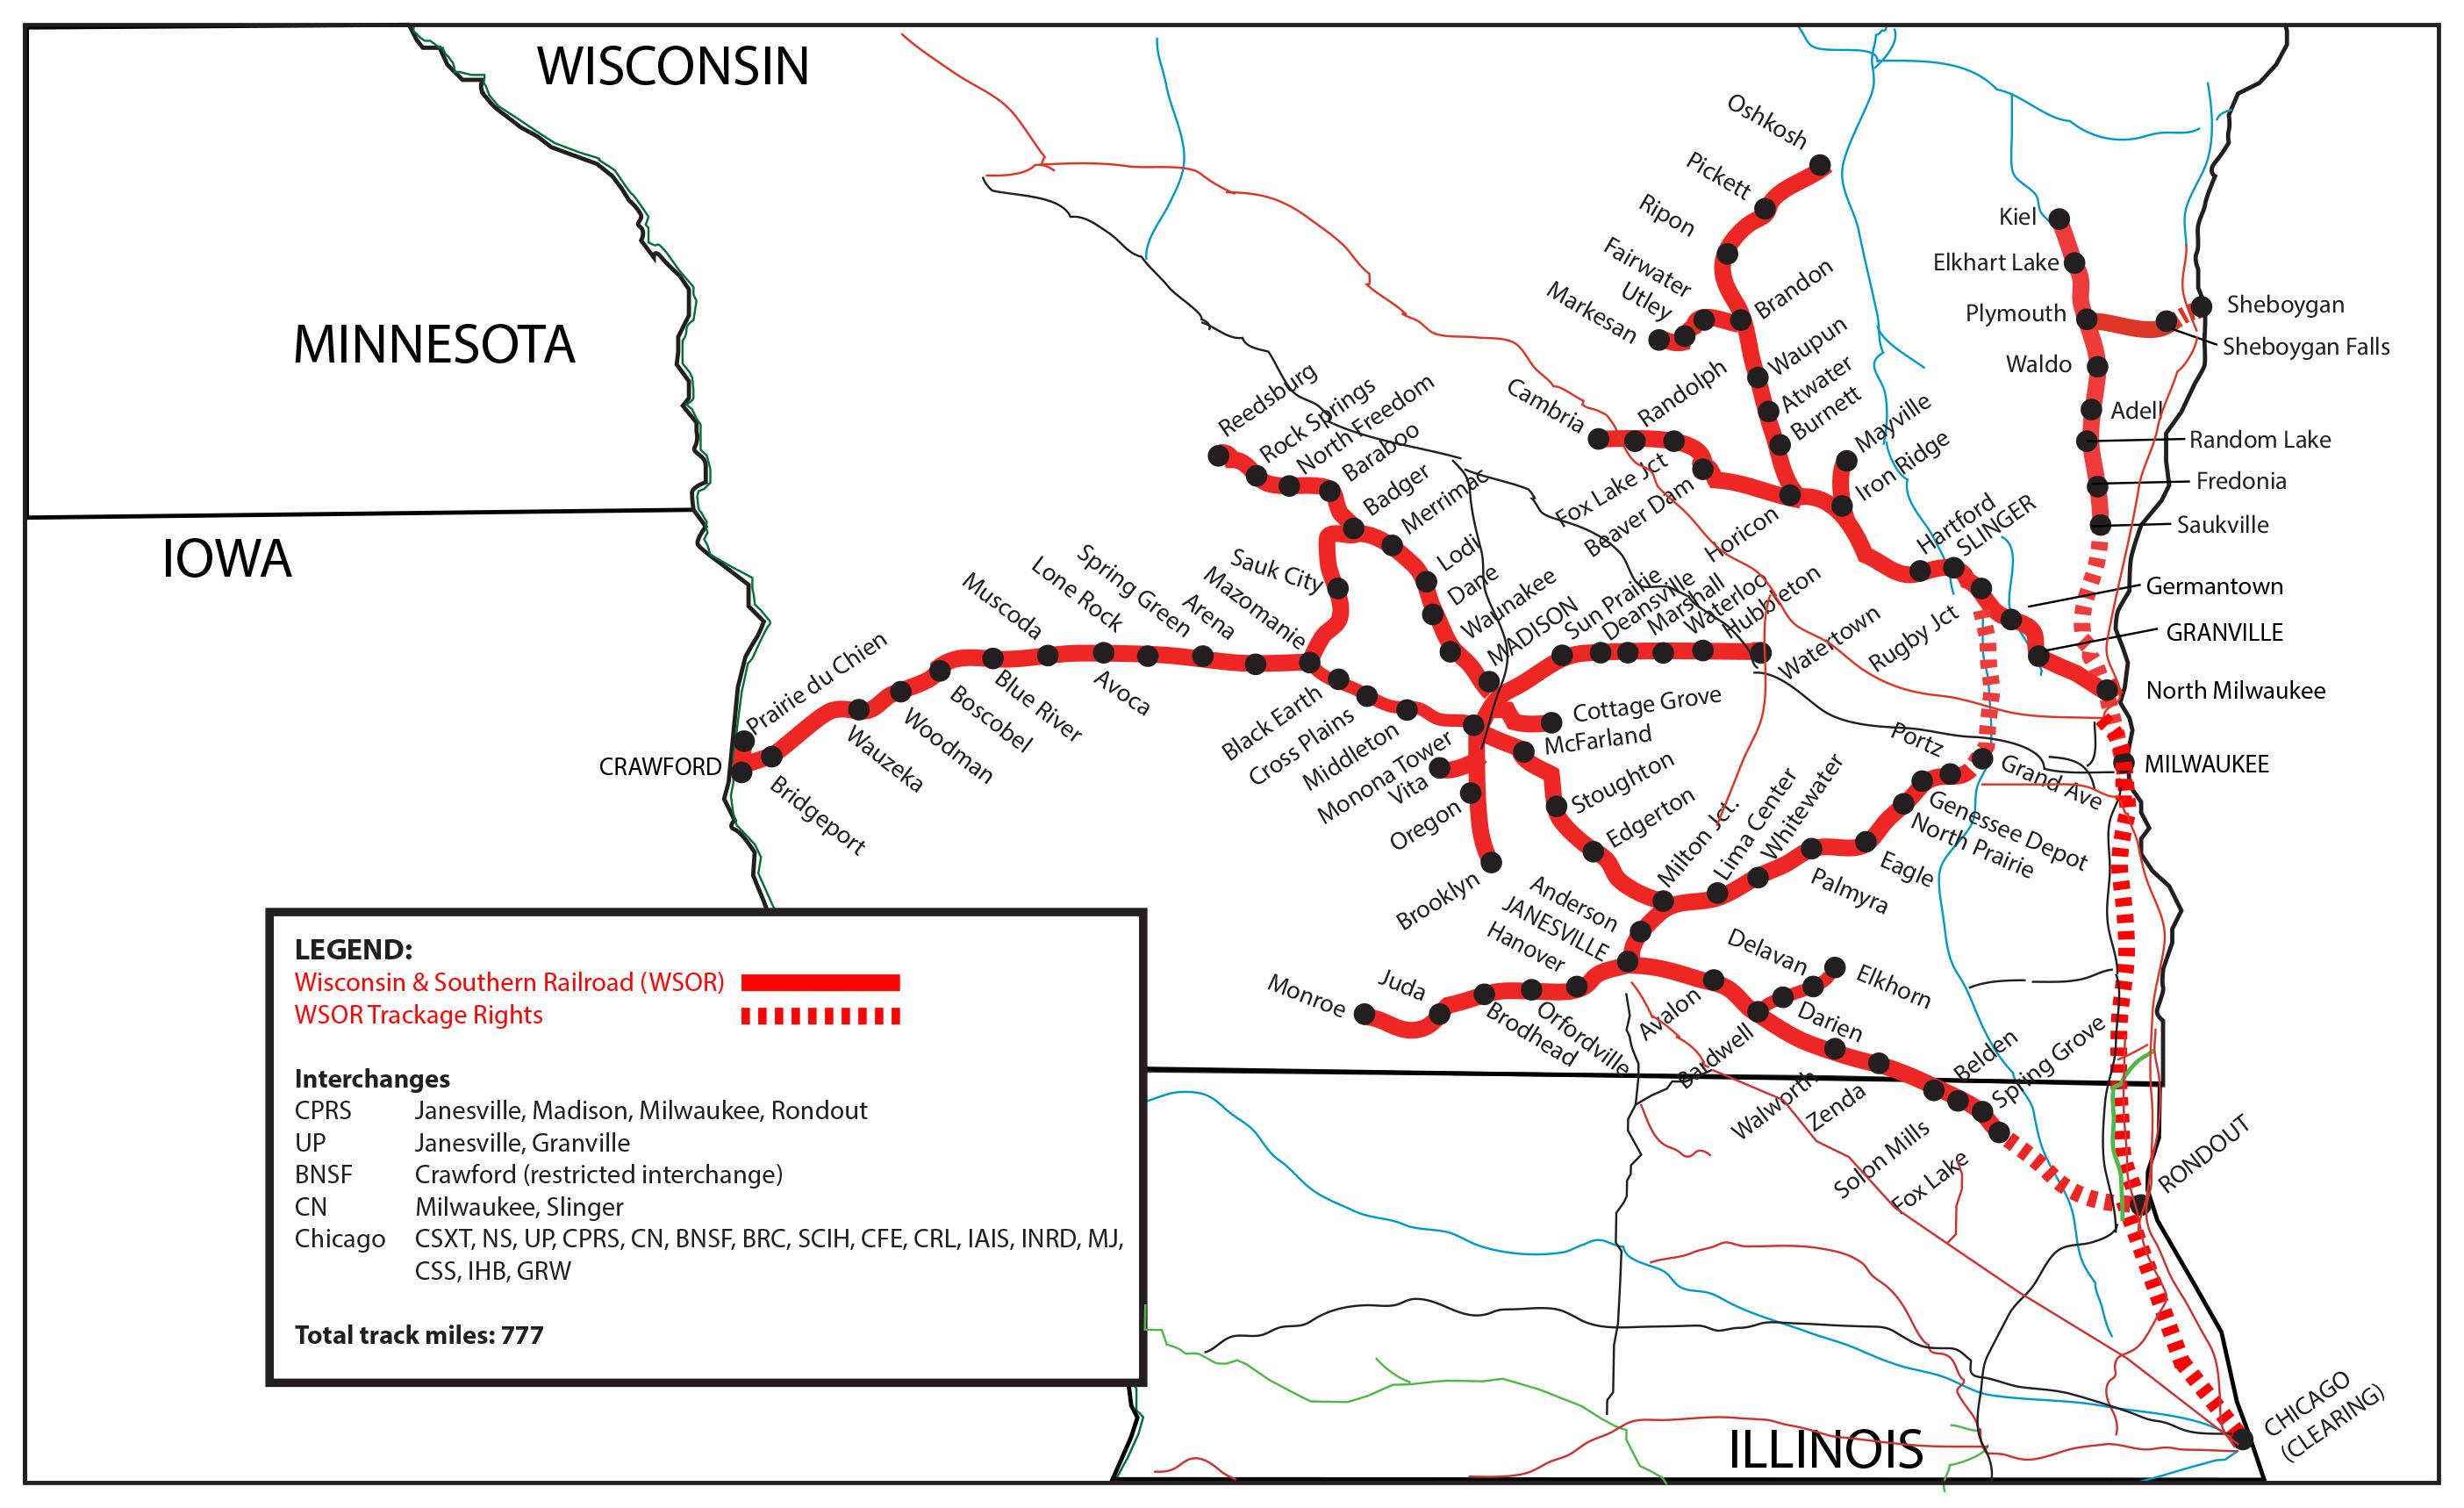 Transportation Company - Wisconsin & Southern - Railroad